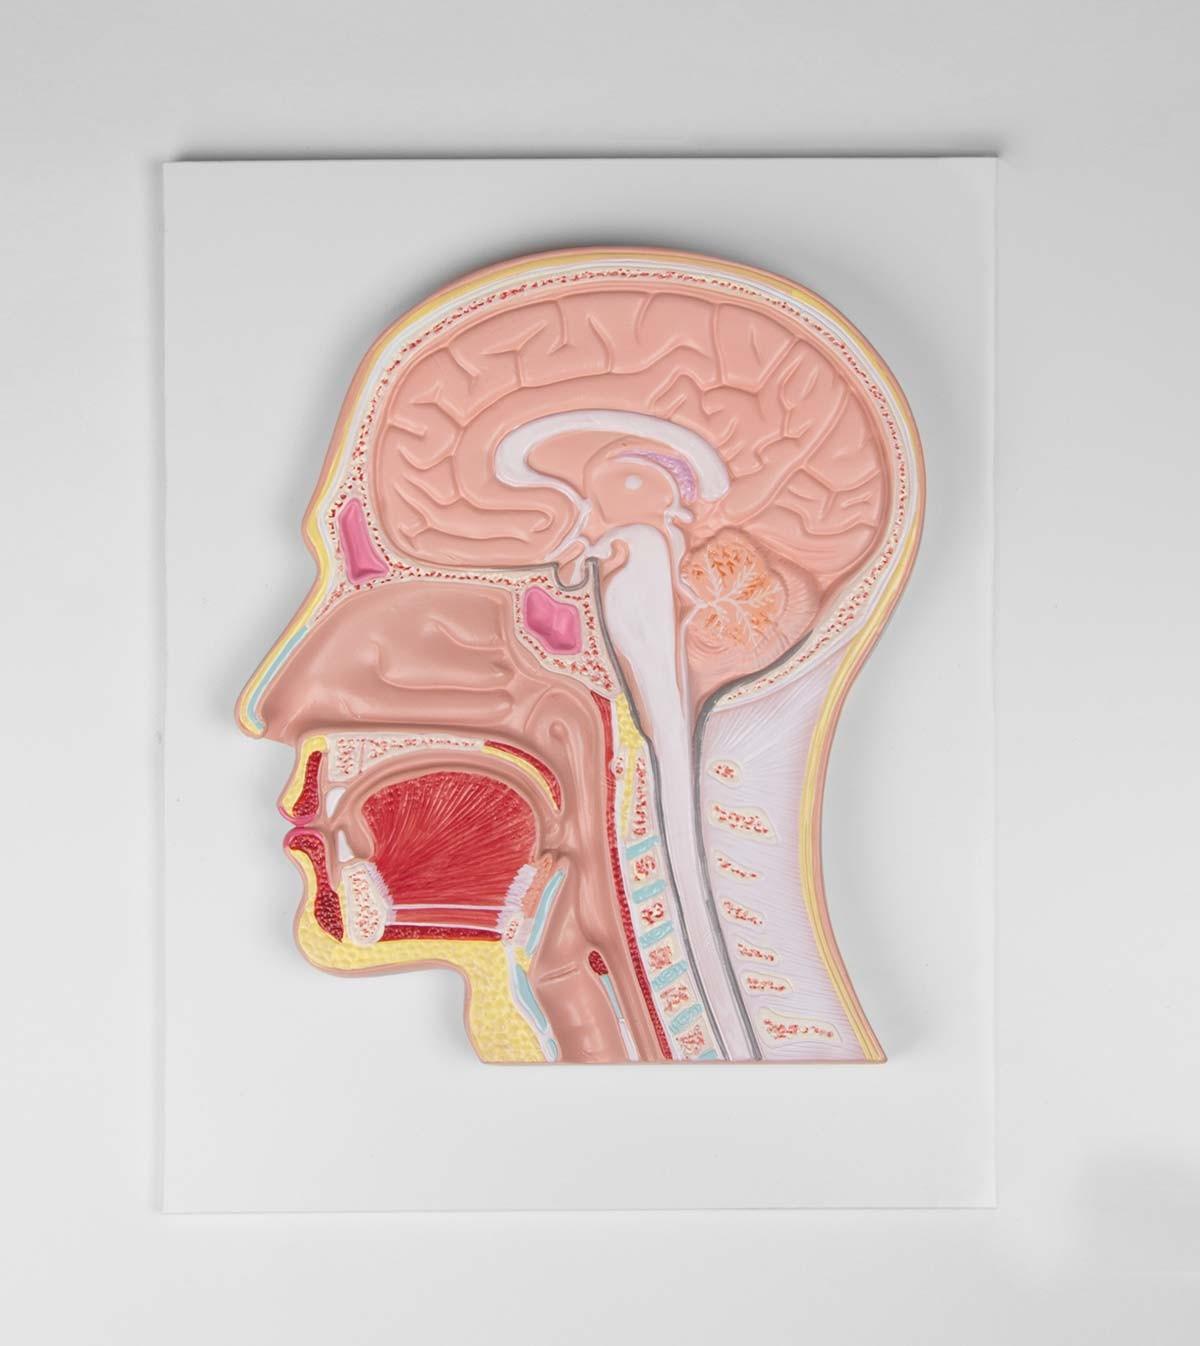 Medianschnitt des Kopfes (Reliefmodell) 1